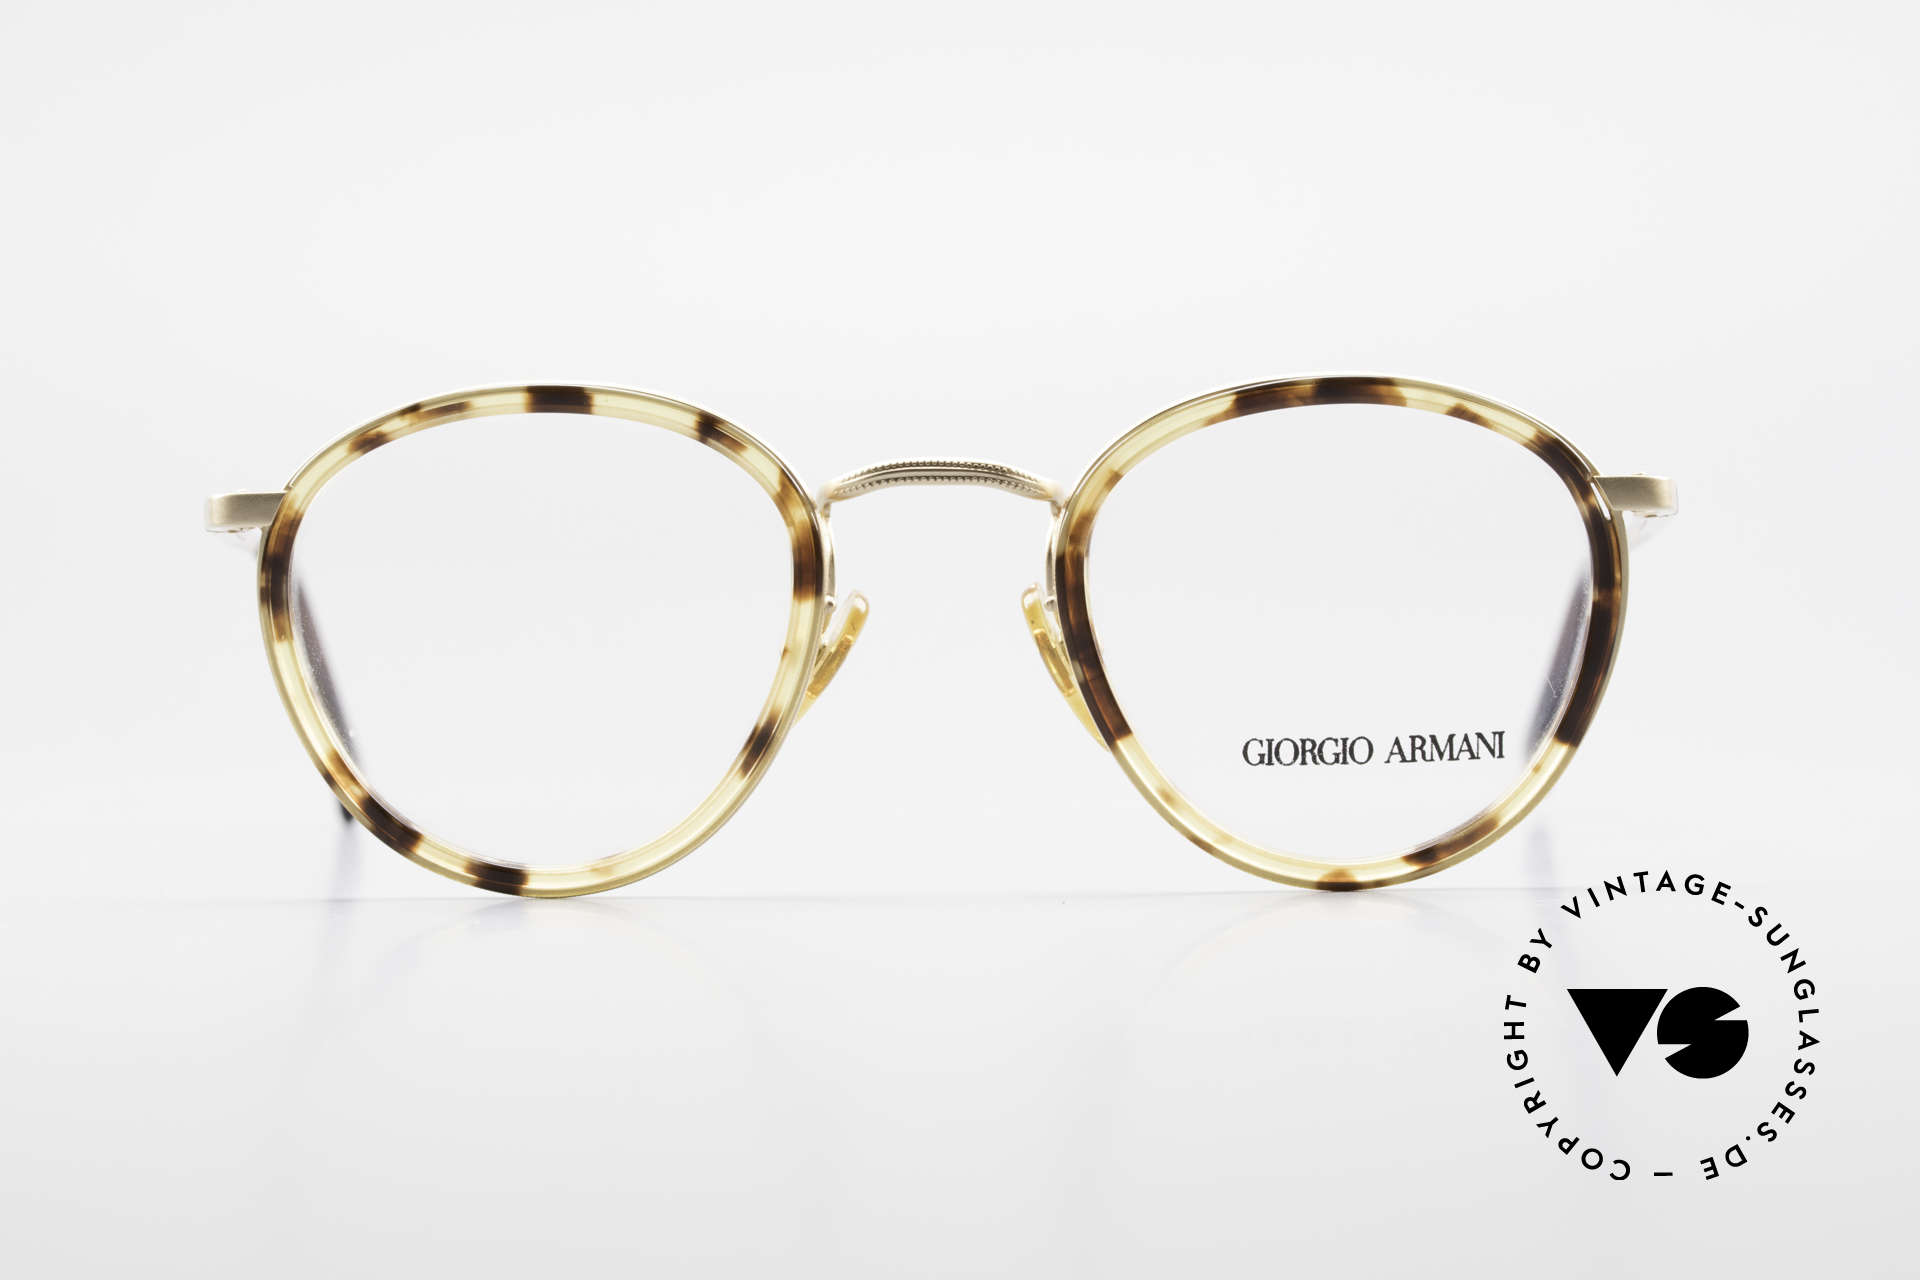 Giorgio Armani 159 Panto Glasses Windsor Rings, more 'classic' isn't possible (famous 'panto'-design), Made for Men